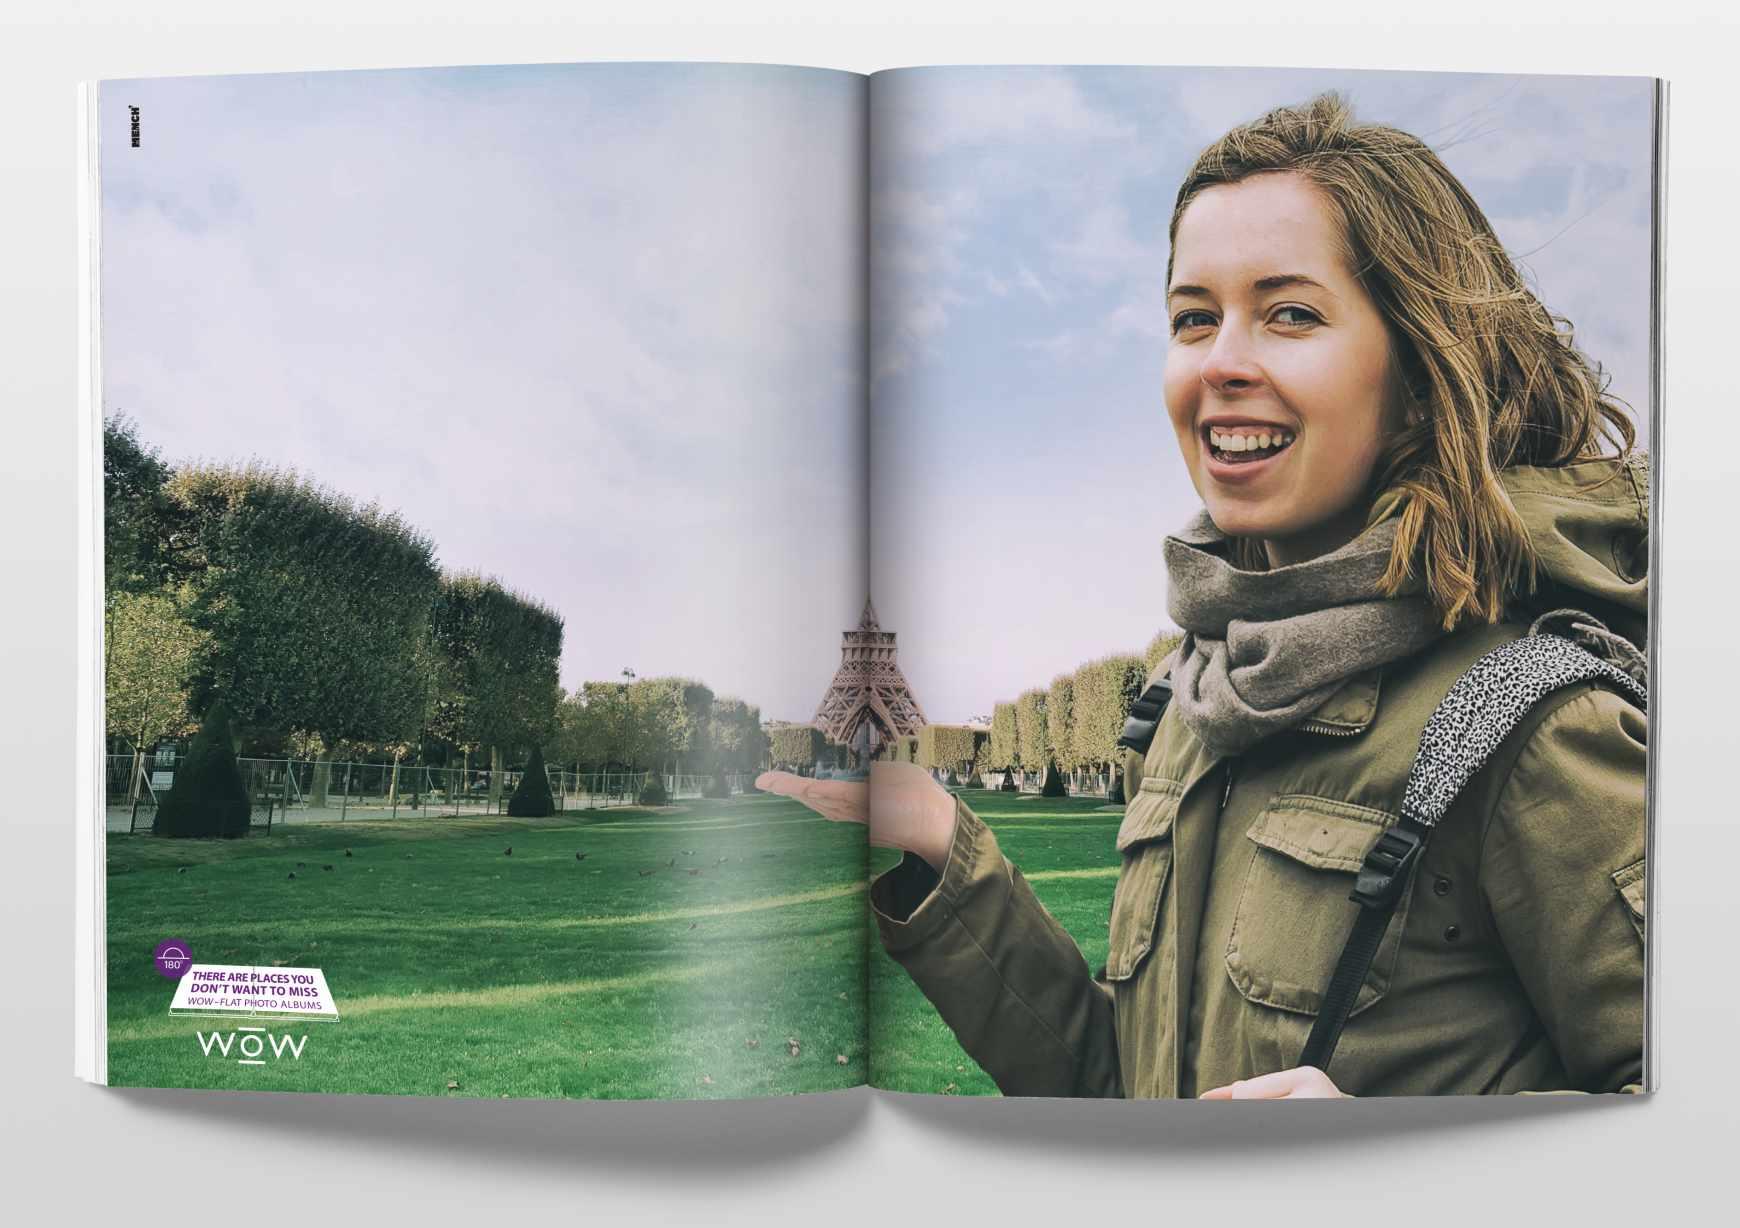 WOW Print Ad - Flat Photo Album